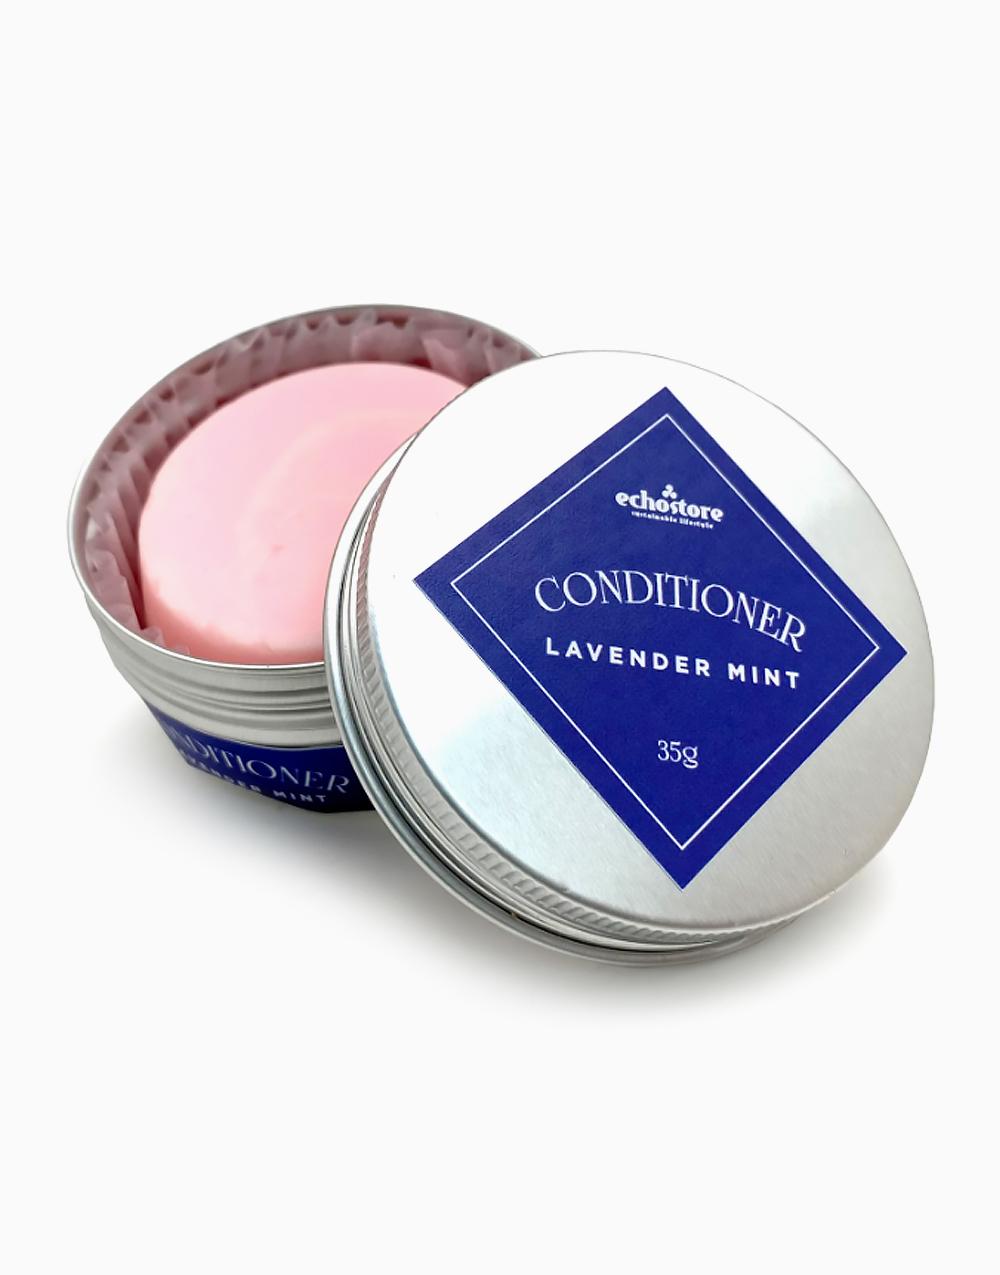 Conditioner Bar (35g) by ECHOstore   Lavender Mint